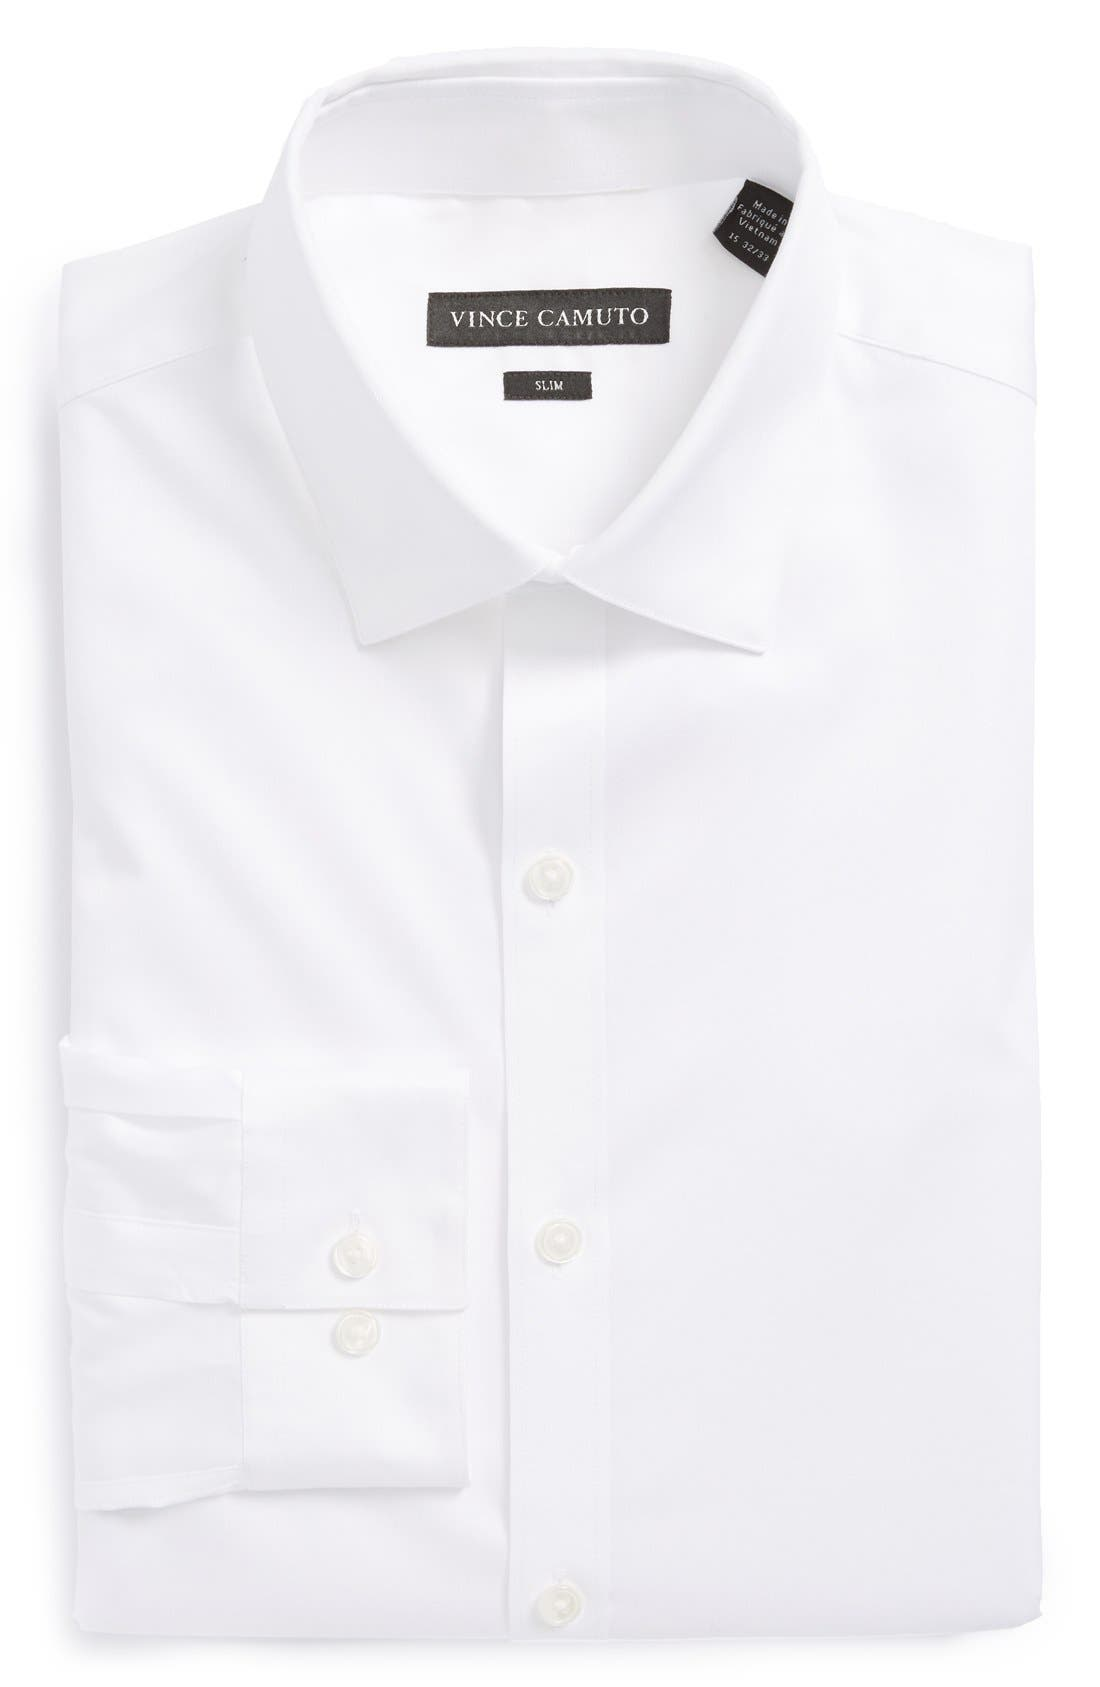 Alternate Image 1 Selected - Vince Camuto Slim Fit Solid Dress Shirt